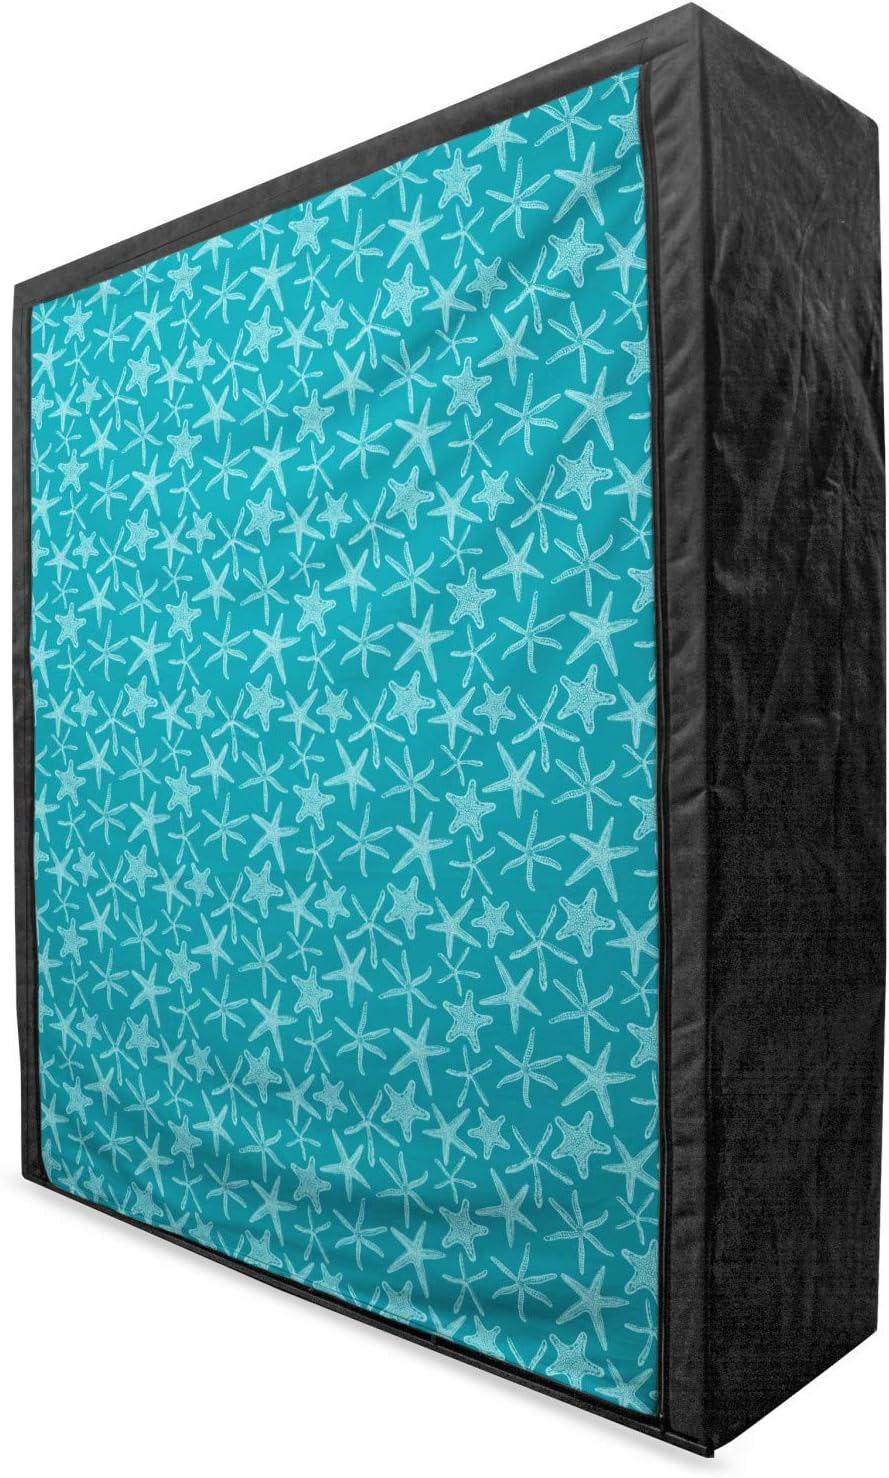 Lunarable Teal Portable Fabric Wardrobe Han Theme Aquatic We OFFer at cheap prices Fauna Regular store